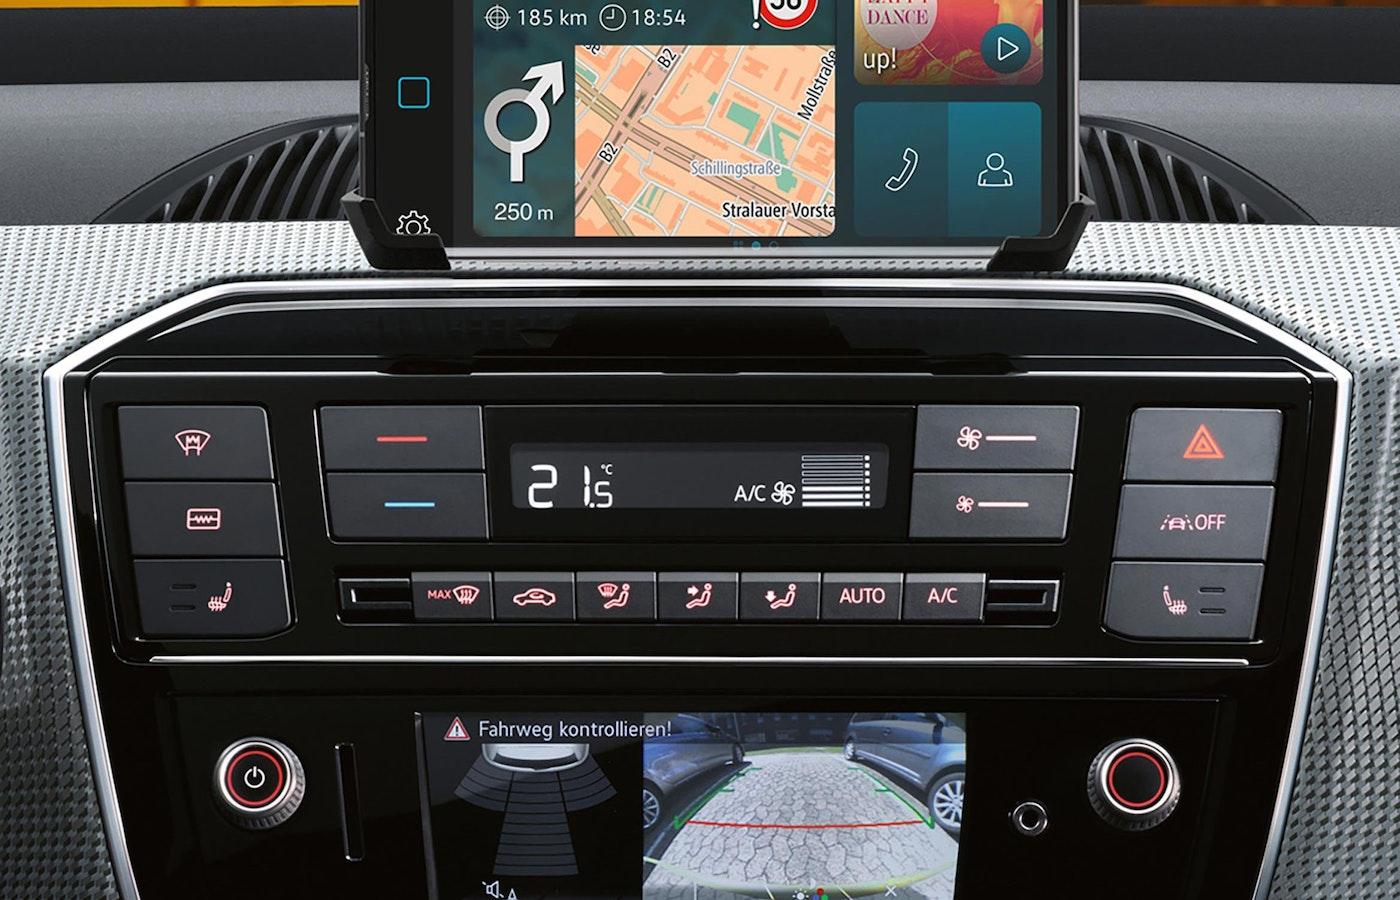 Useful dashboard